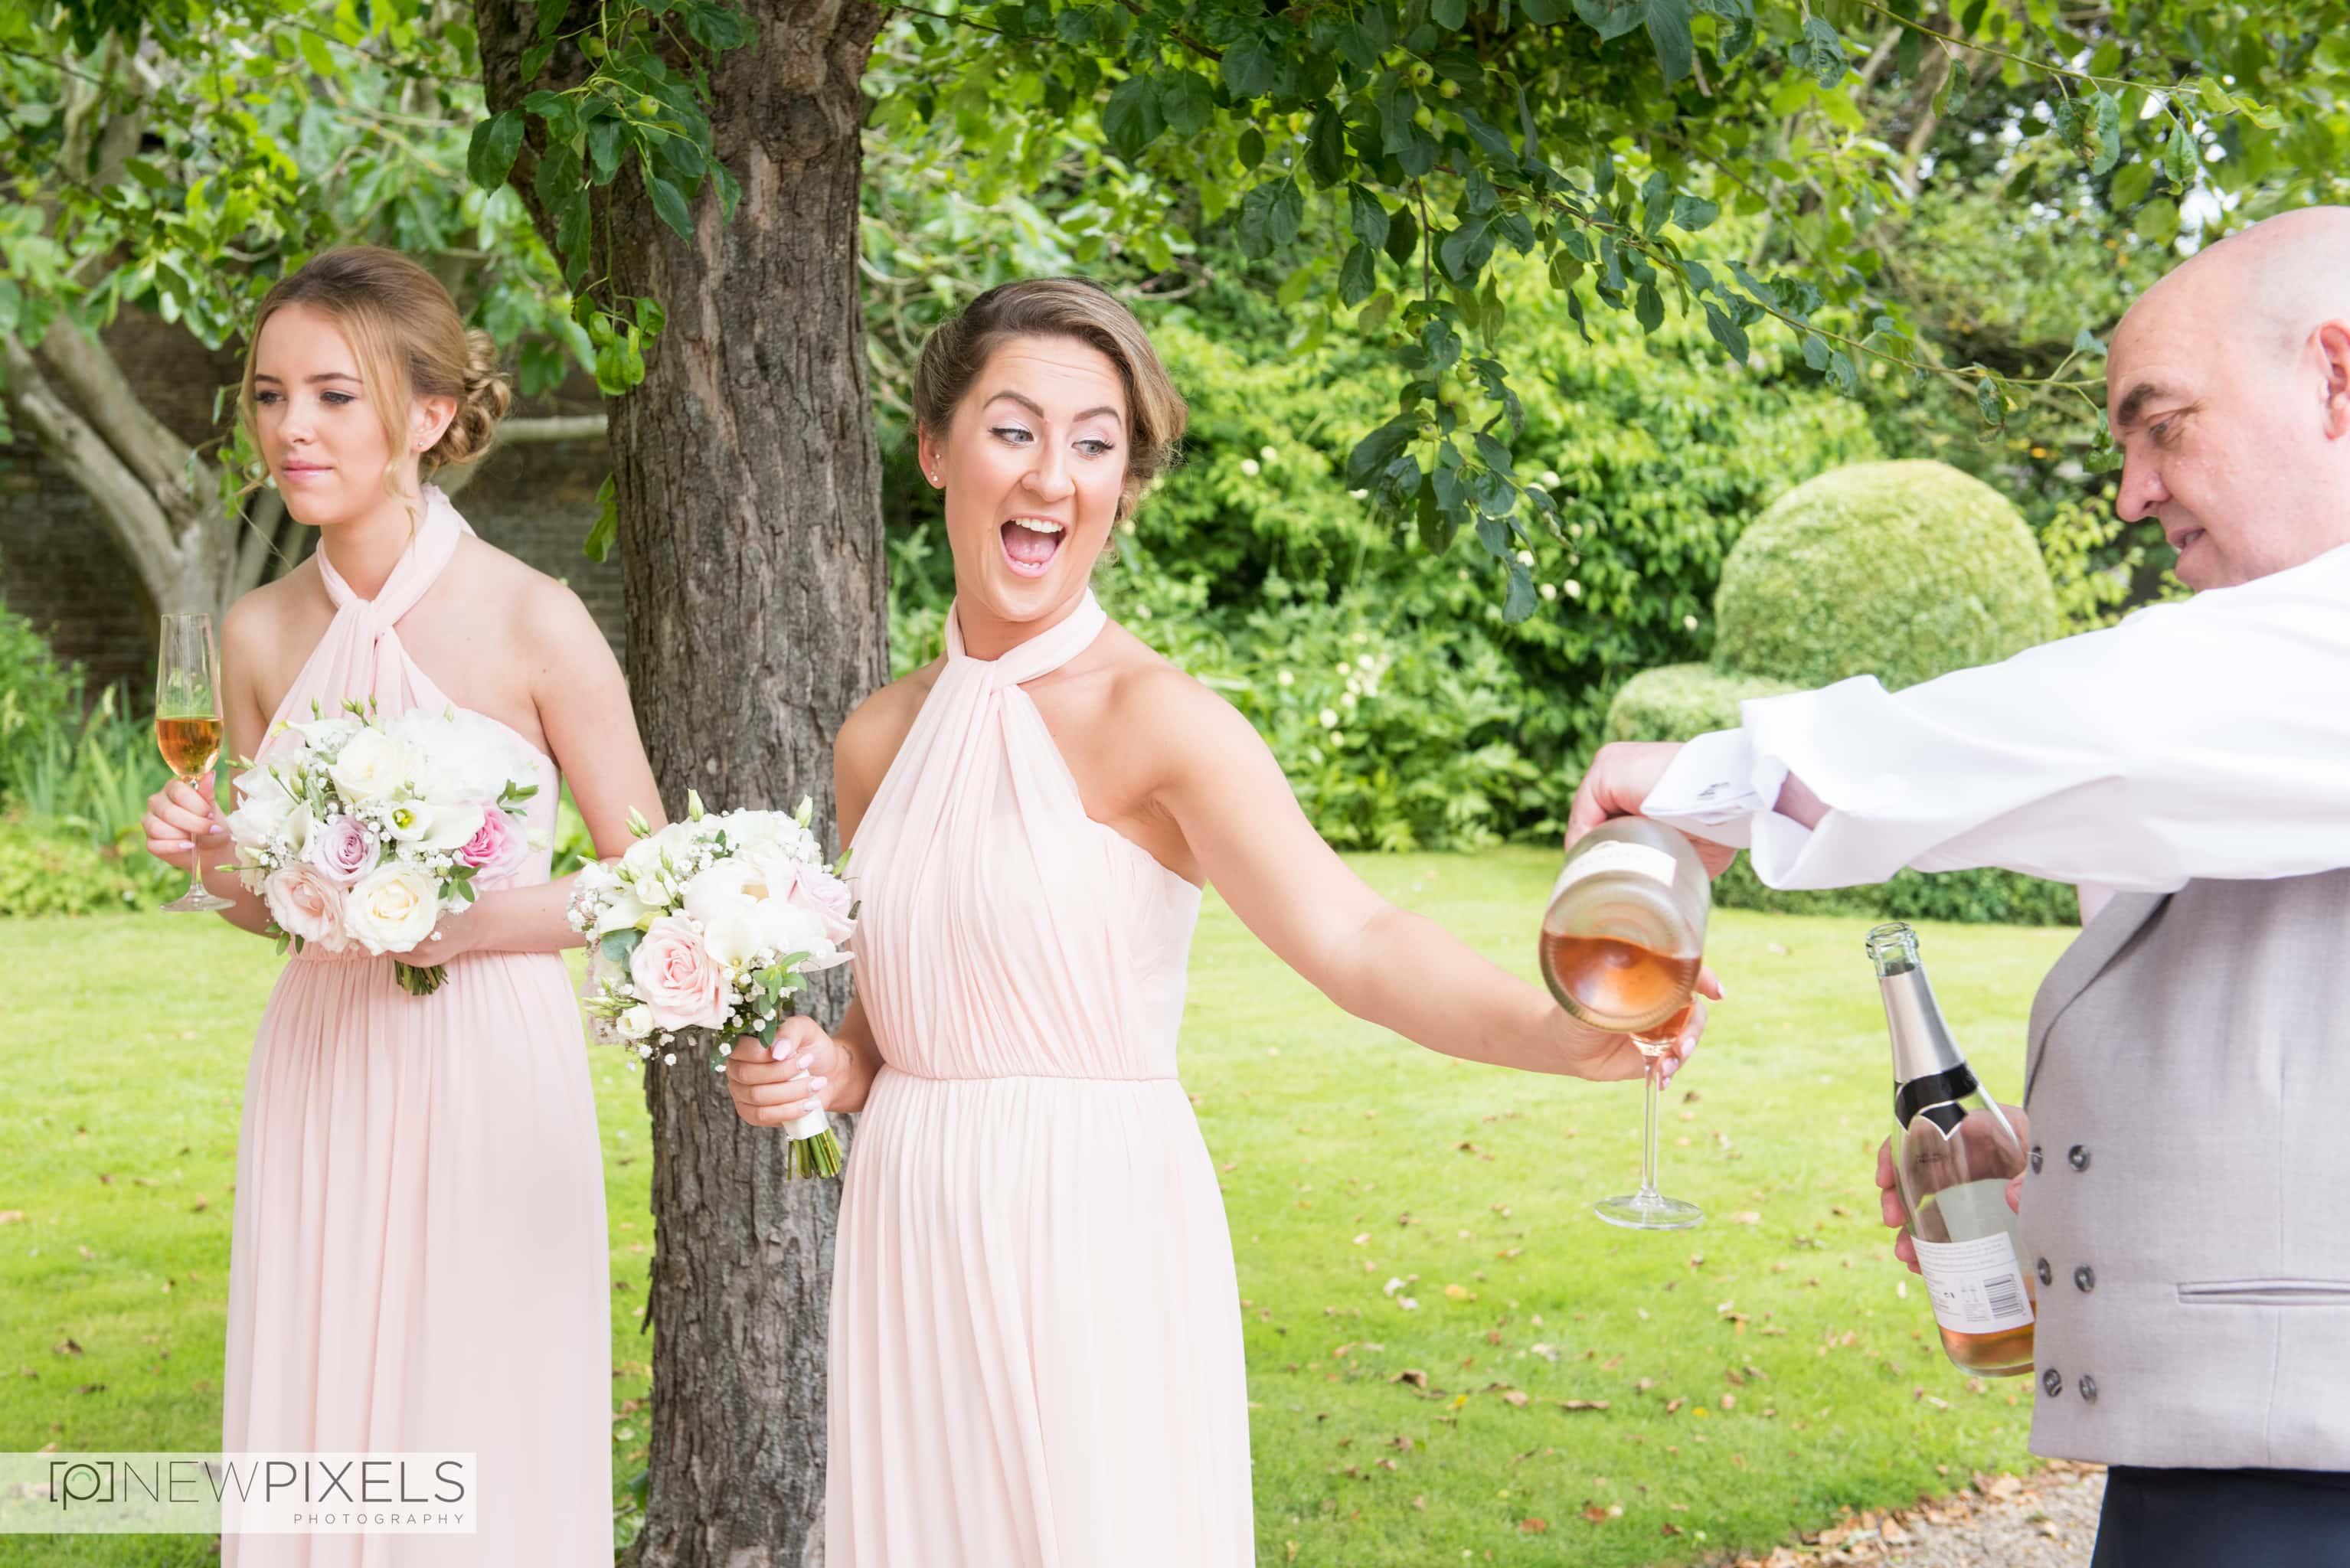 Wedding Photography Matching Green-19